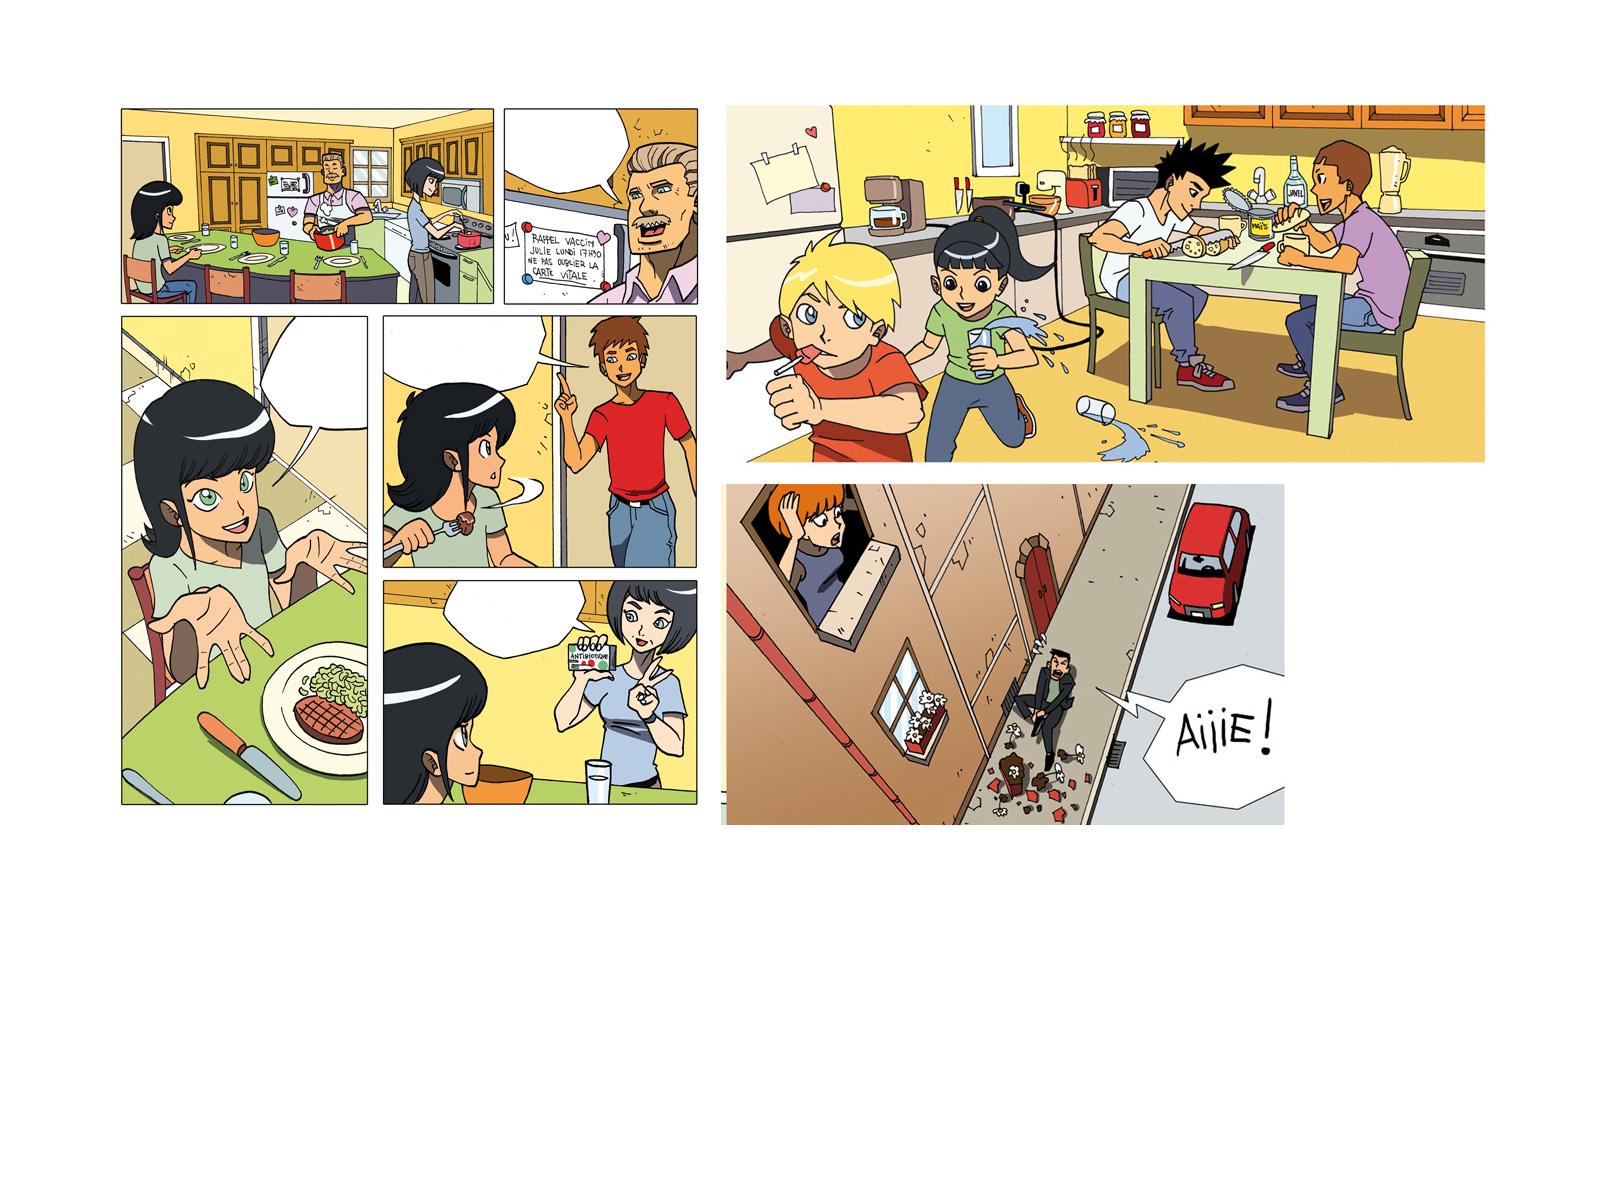 illustrations-alfonsorecio-4558